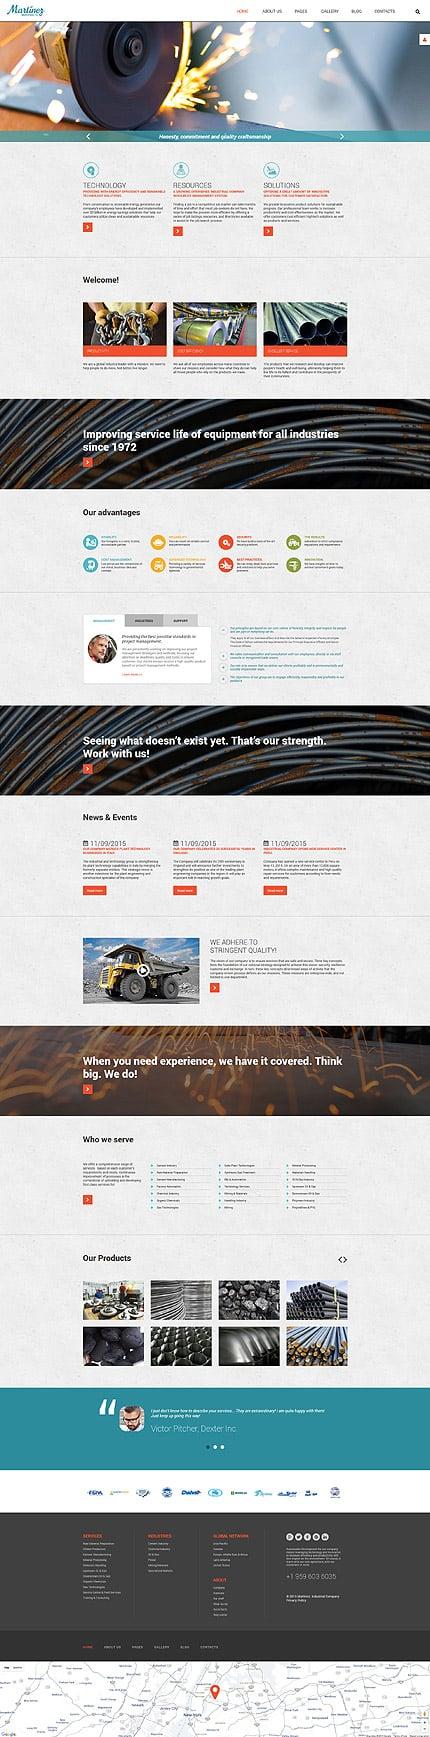 Joomla Theme/Template 55746 Main Page Screenshot